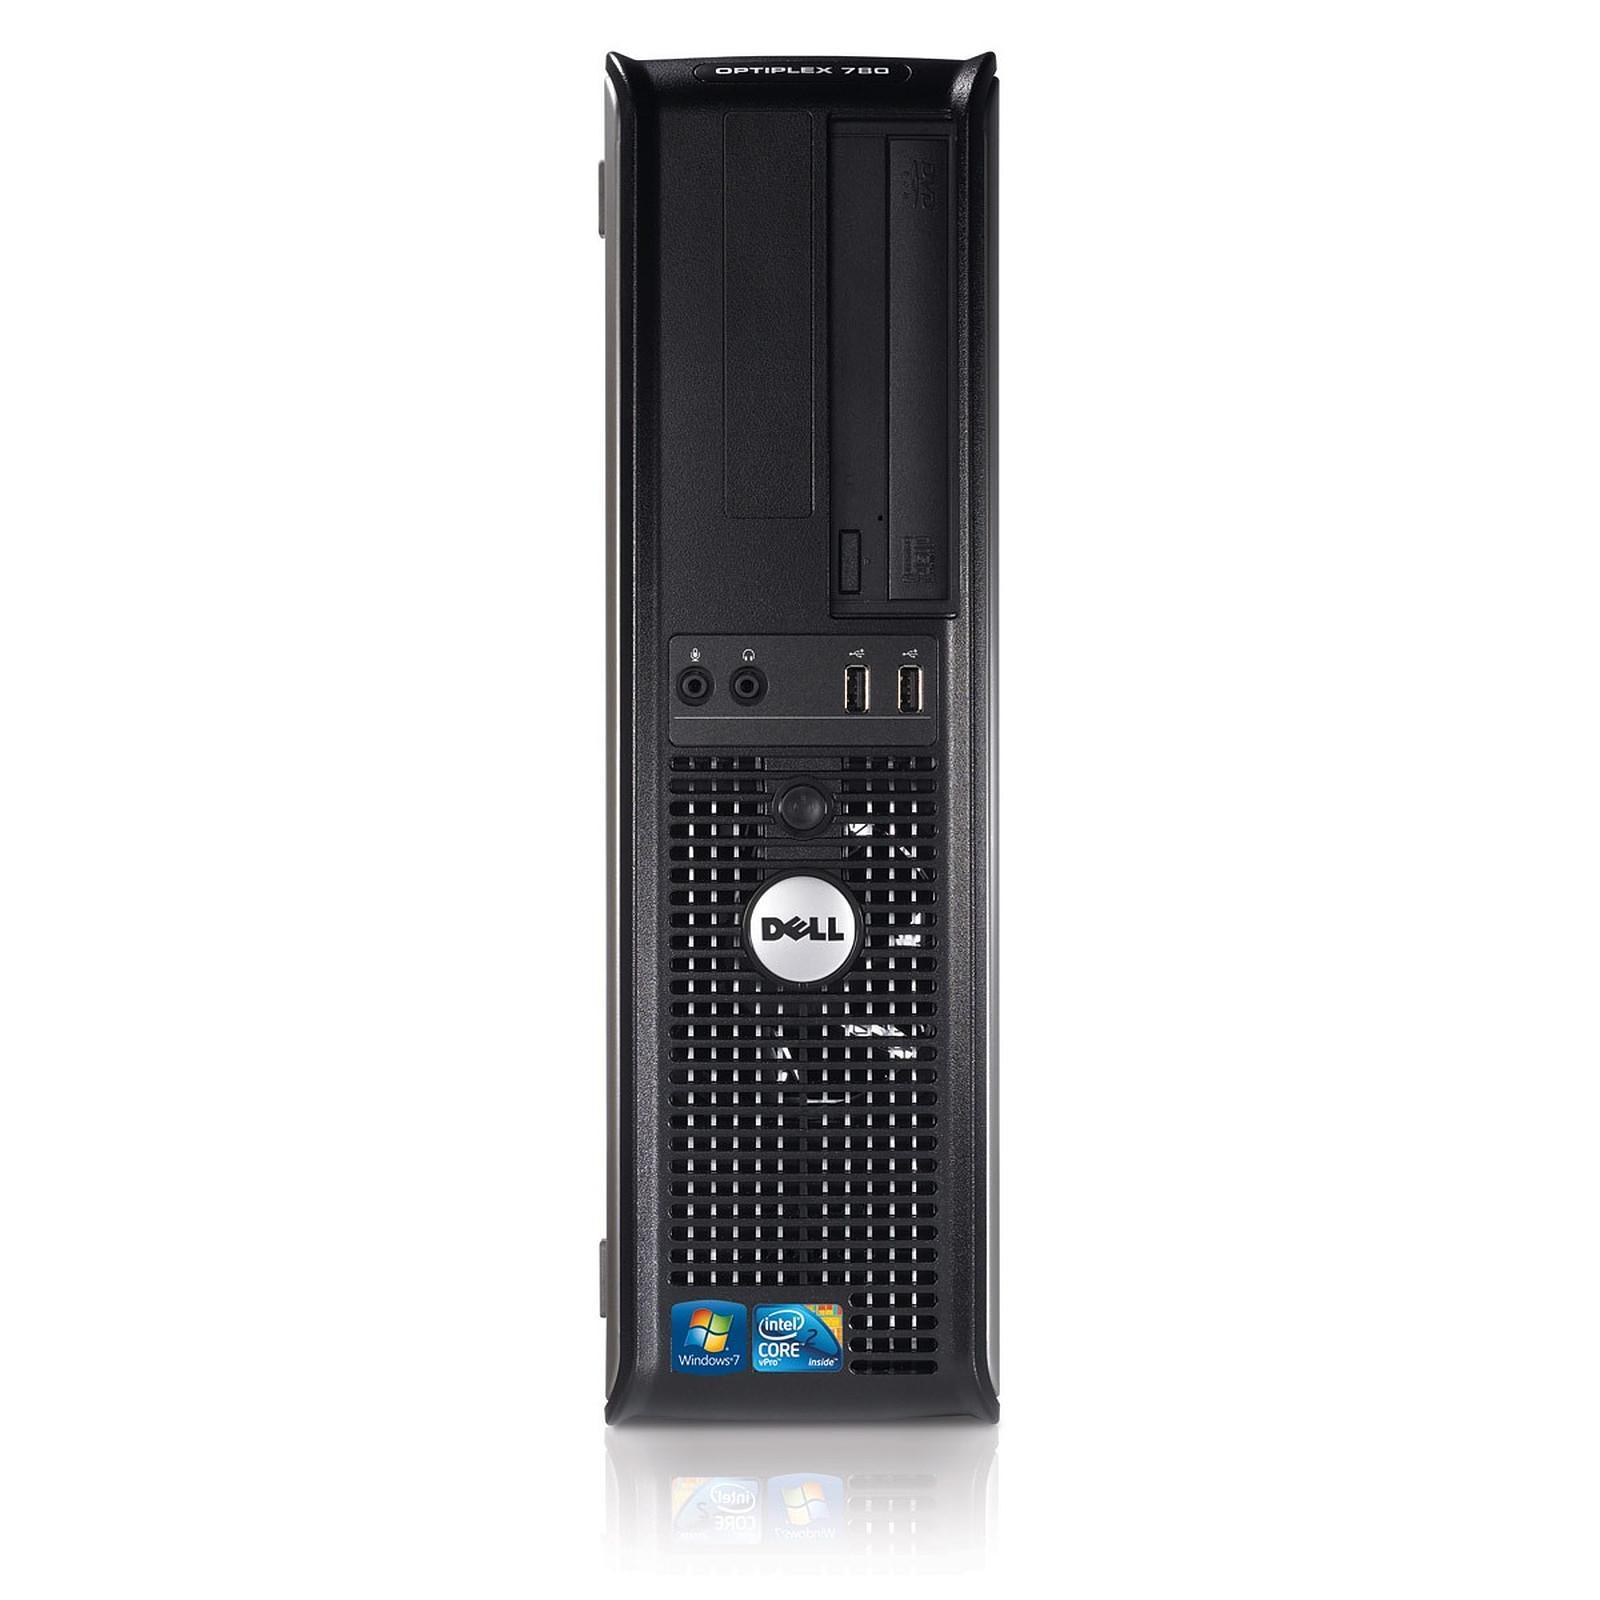 Dell Optiplex 780 DT Pentium 2,5 GHz - HDD 480 Go RAM 4 Go